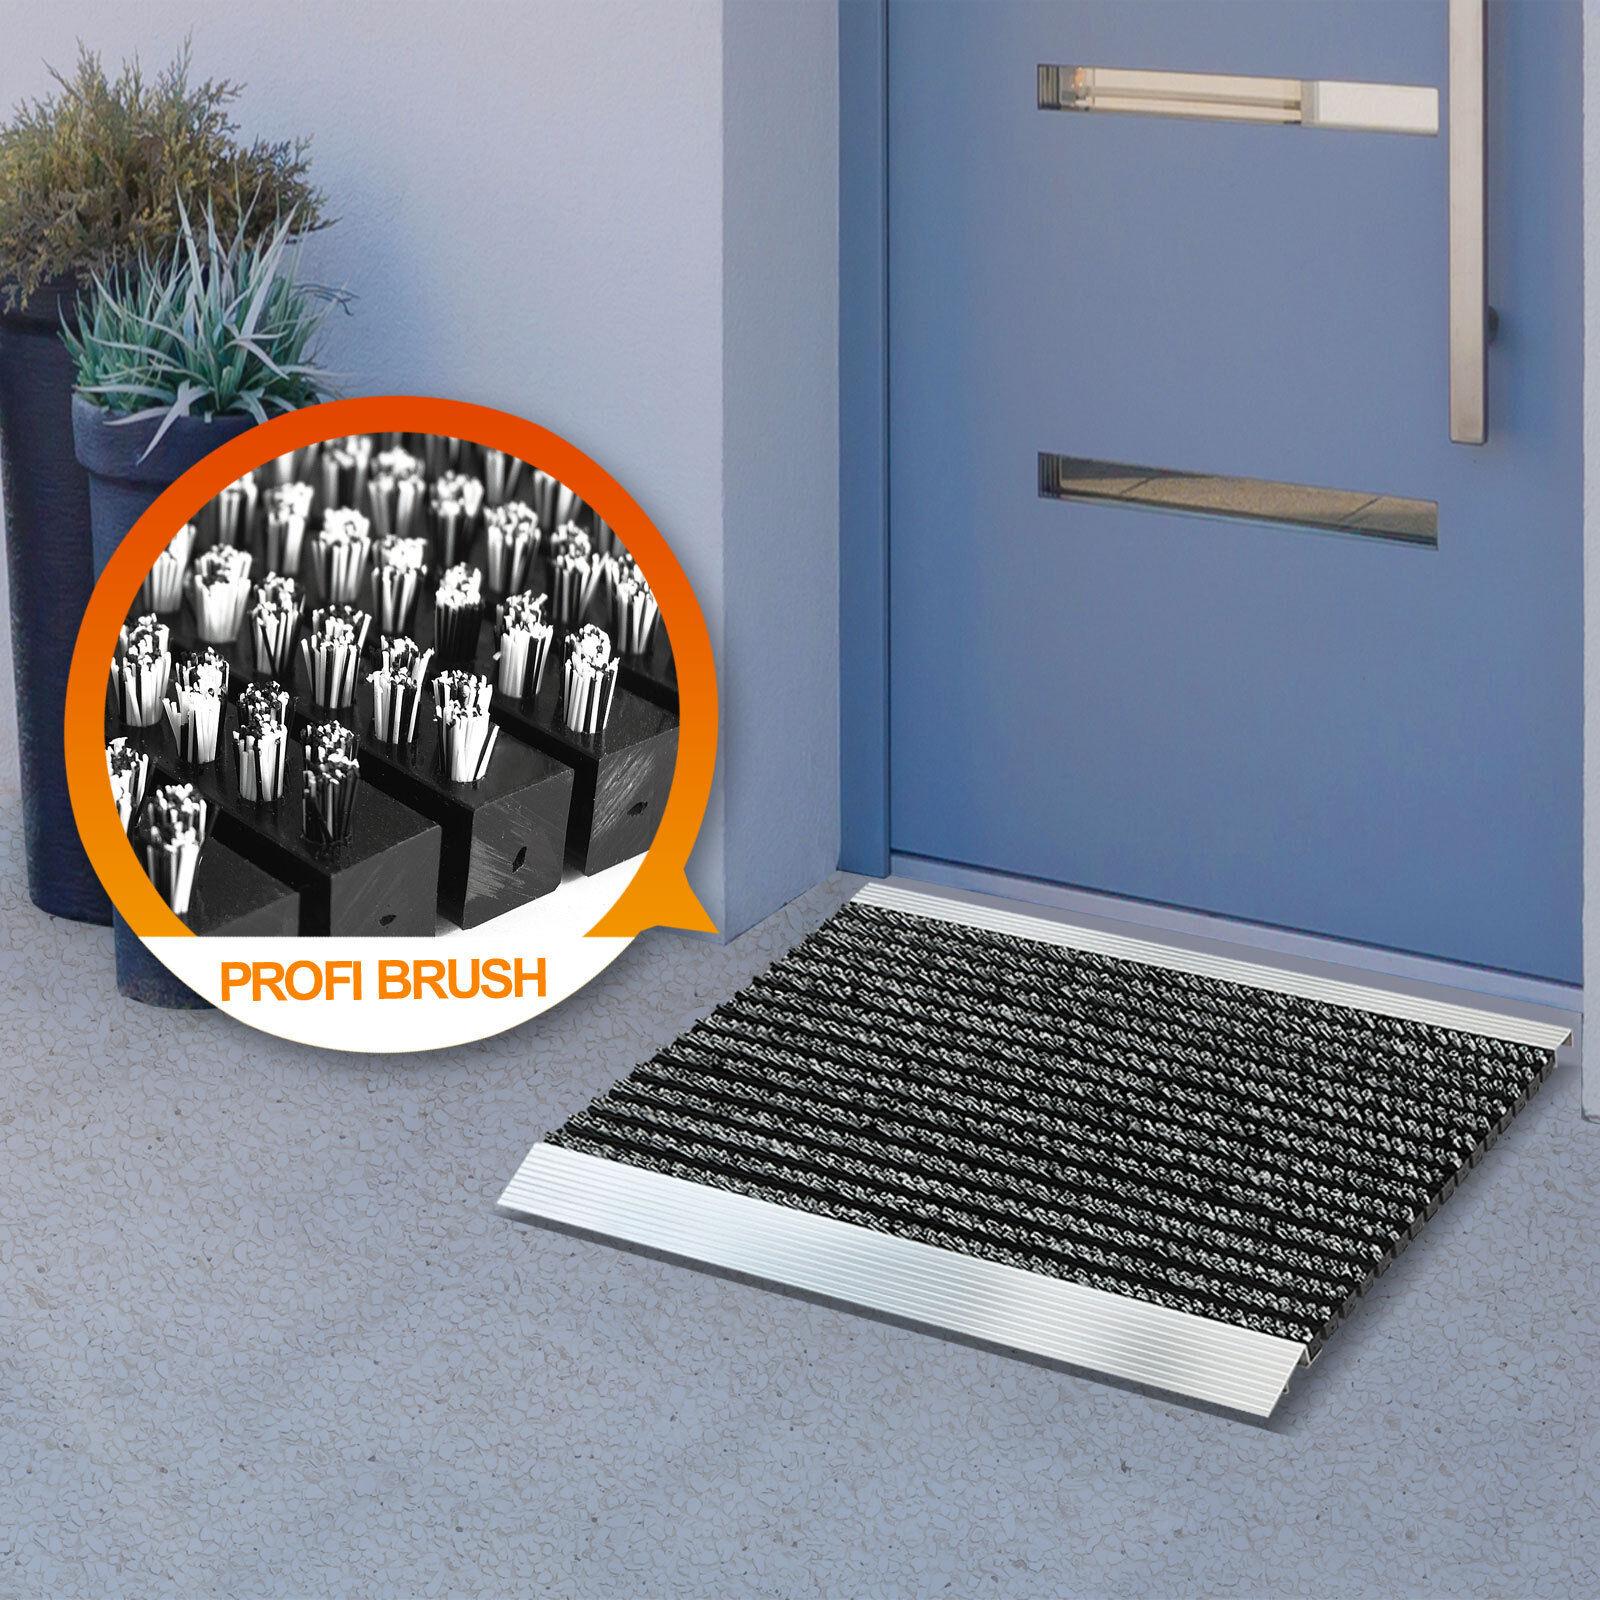 Profi Brush Design Fußmatte Türmatte Fussabtreter Eingangsmatte Eingangsmatte Eingangsmatte Fussmatten BW 25f95a